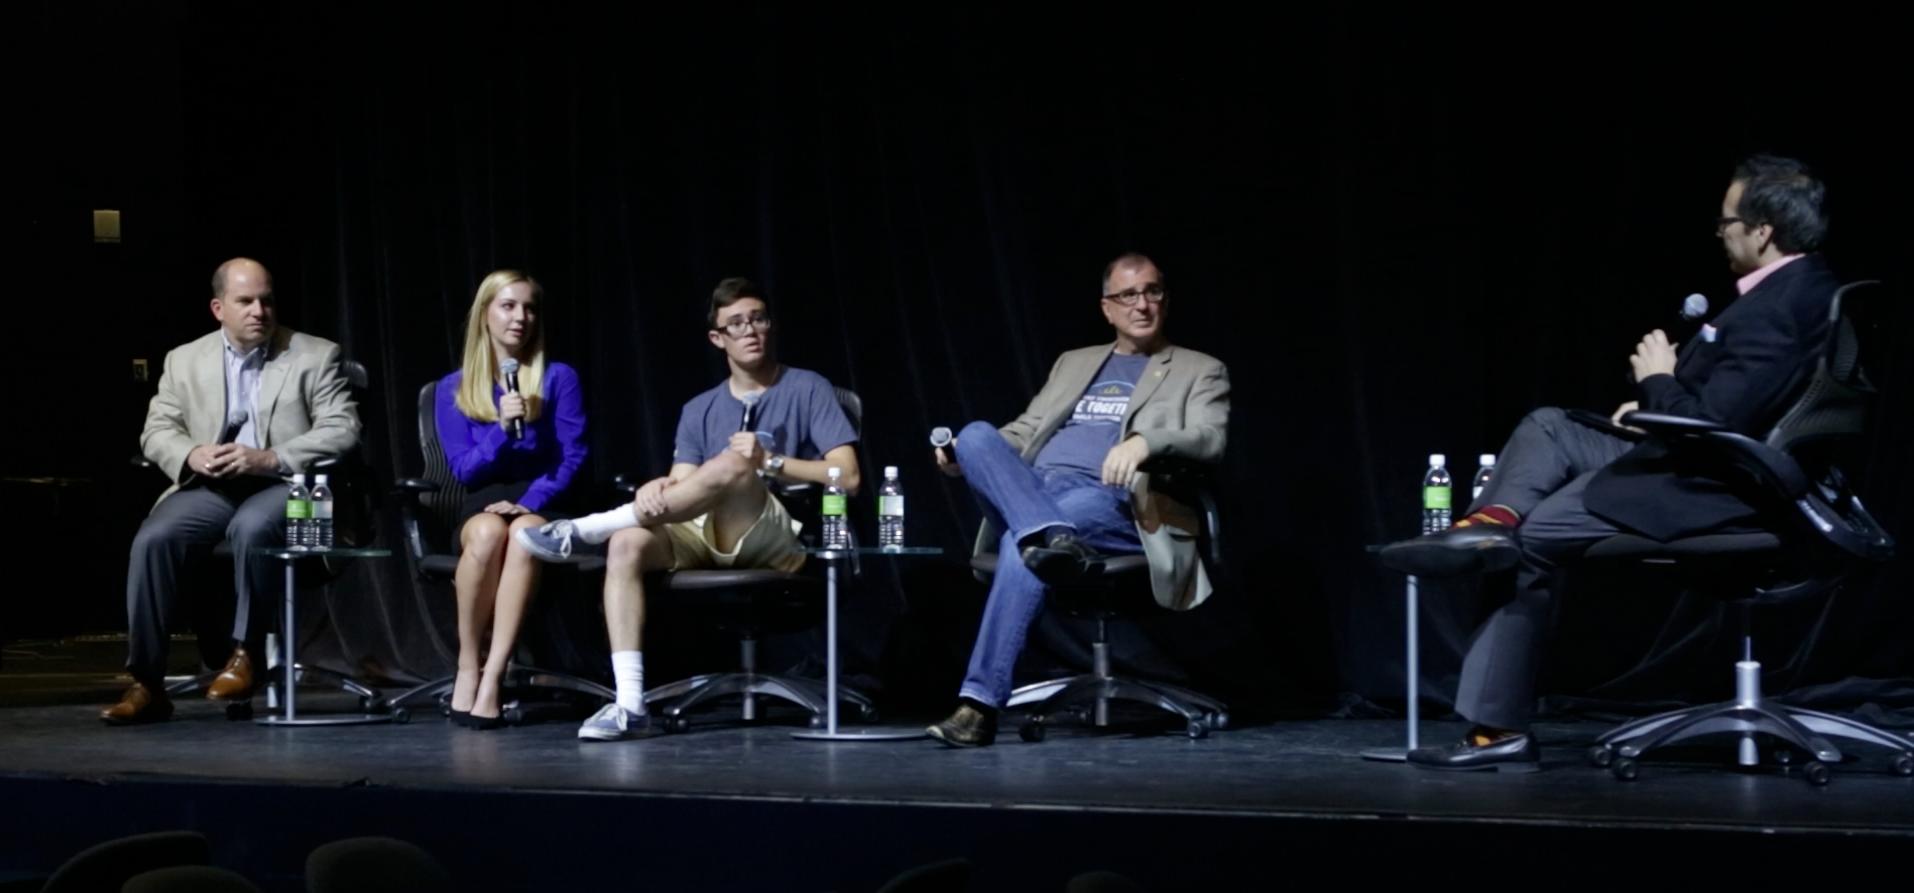 L-R: Allen Fazio (The Walt Disney Company), Ashley Fazio, Zach Basile, Louis Basile (Wildflower)